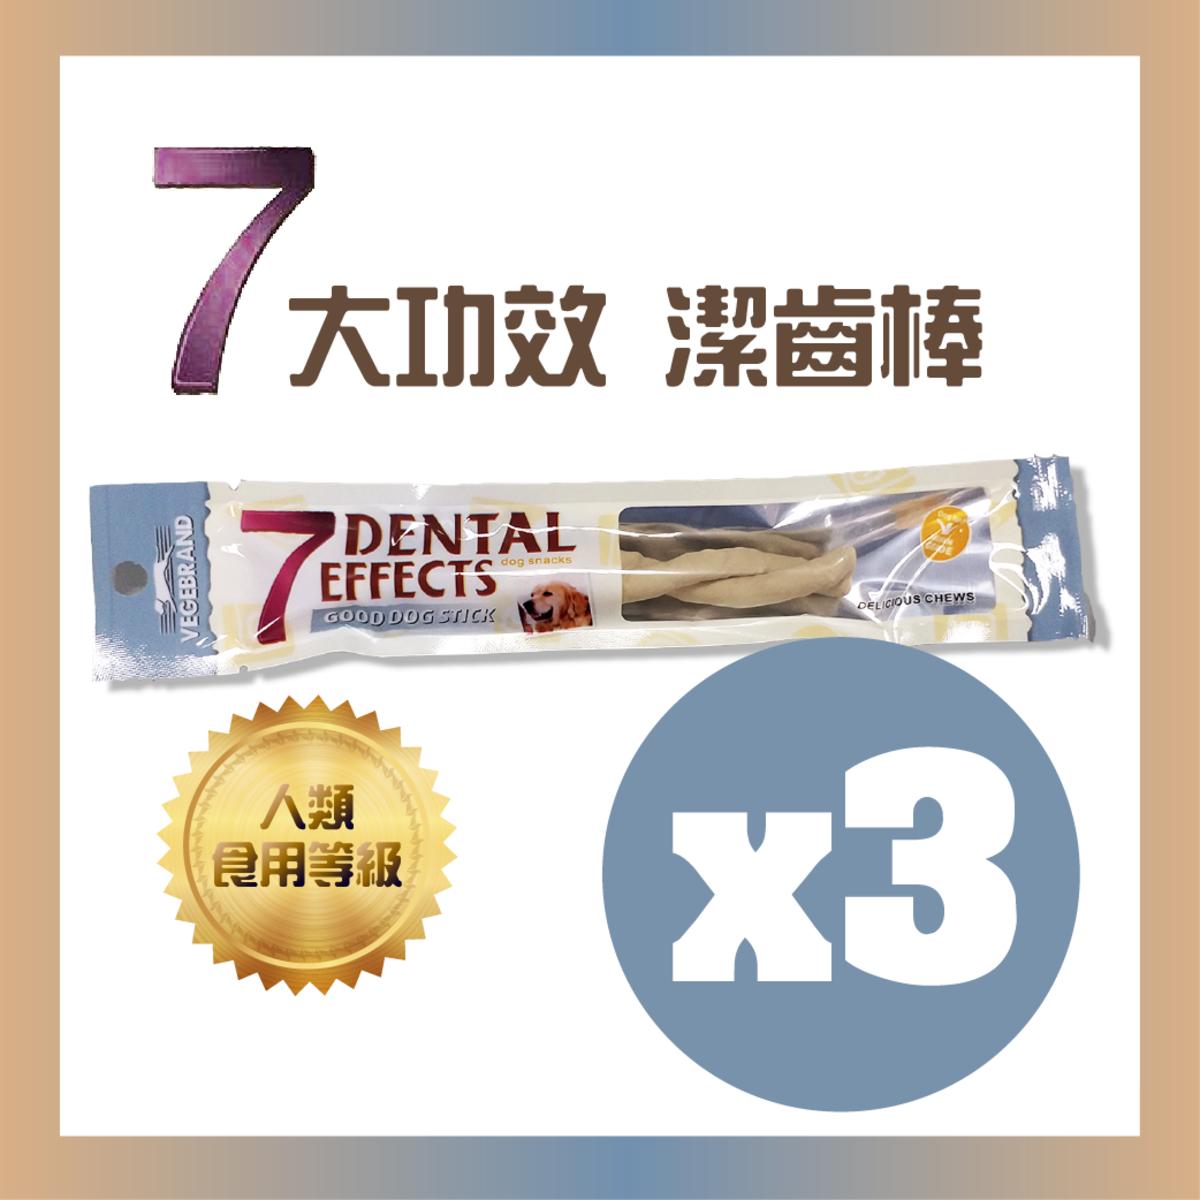 Milky Salmon Stick x 3 packs (VBD-1041_3)